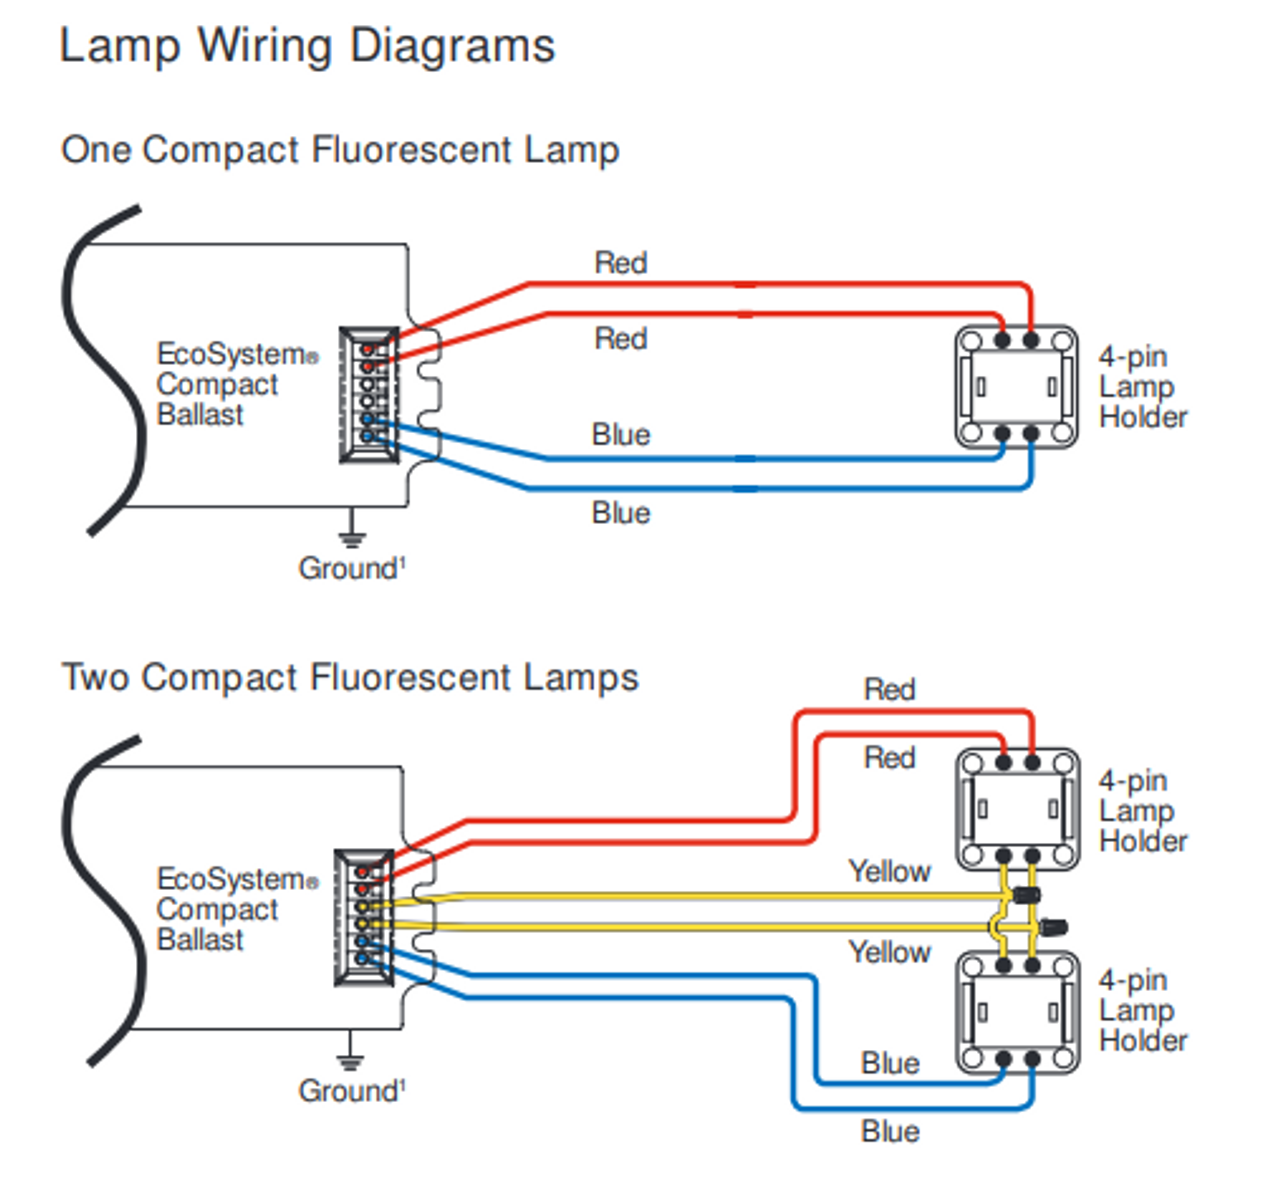 EC3DT4MWKU1S Lutron Electronic Fluorescent Dimming Ballast | Ge Dimming Ballast Wiring Diagram |  | BallastShop.com